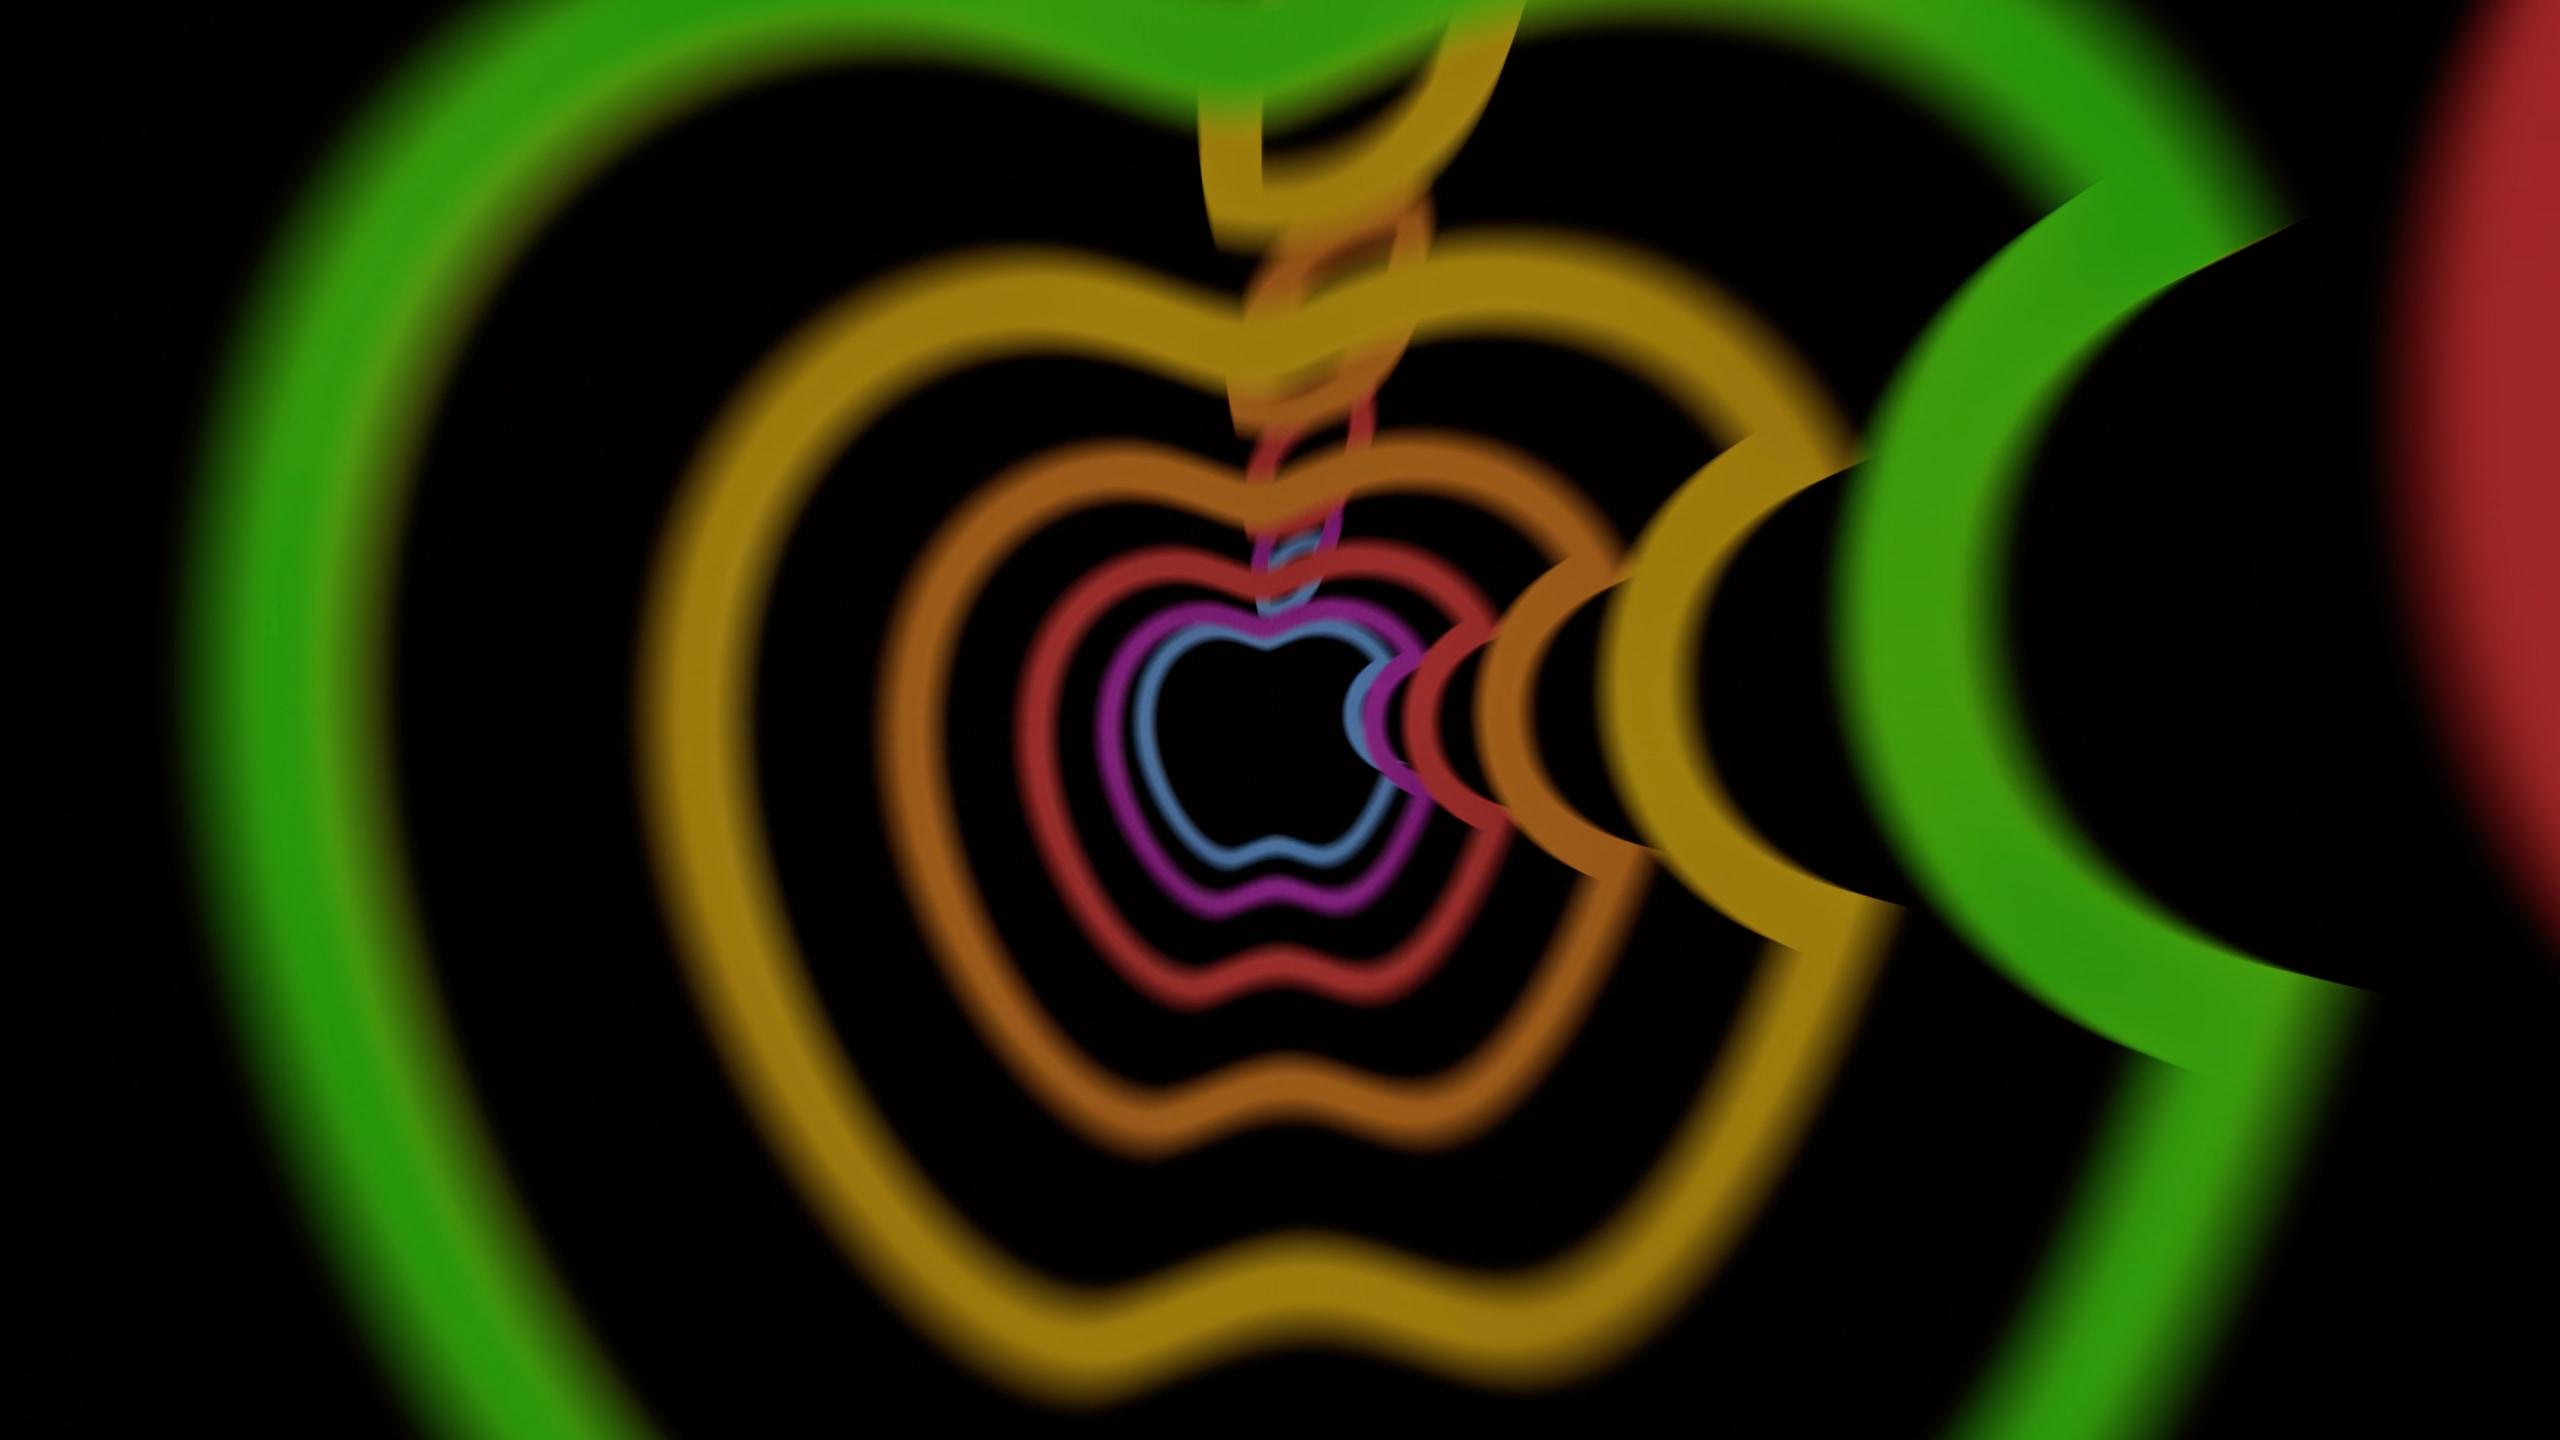 Apple Event 2021 Jon Prosser / Digital Apple Event May ...